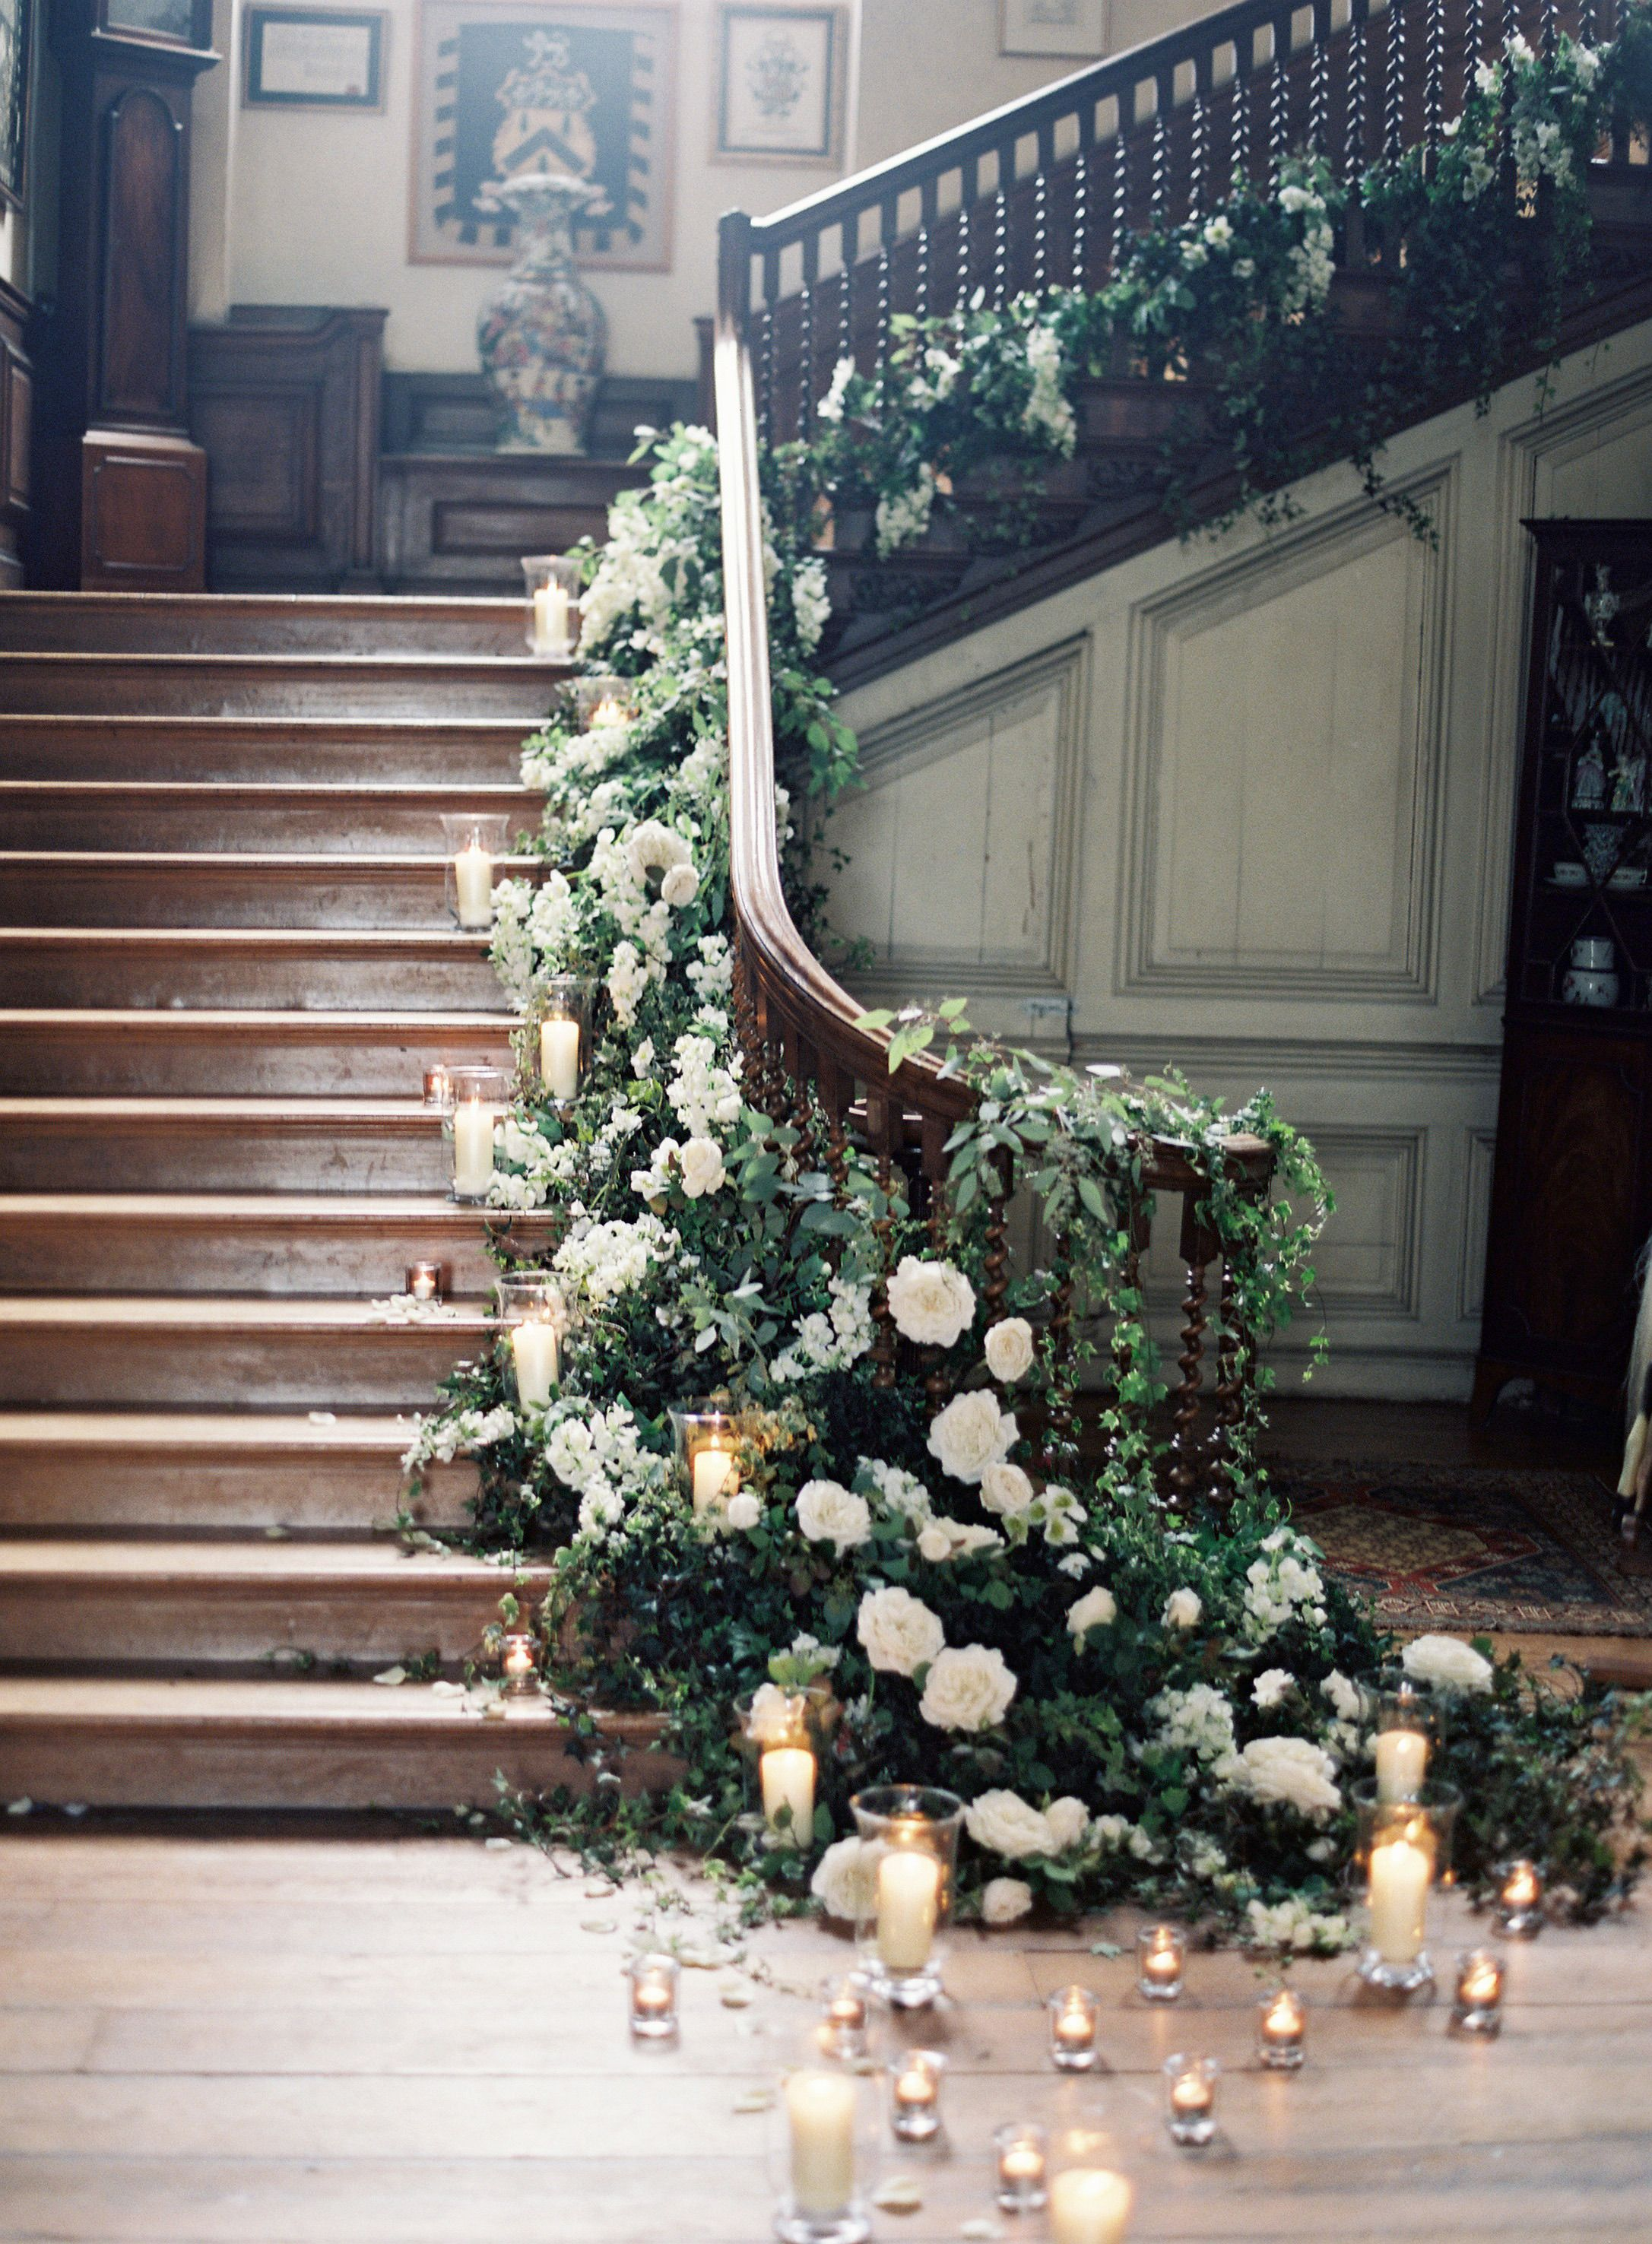 Wedding decorations hanging from trees  Glemham Hall Wedding  party deco inspires  Pinterest  Wedding